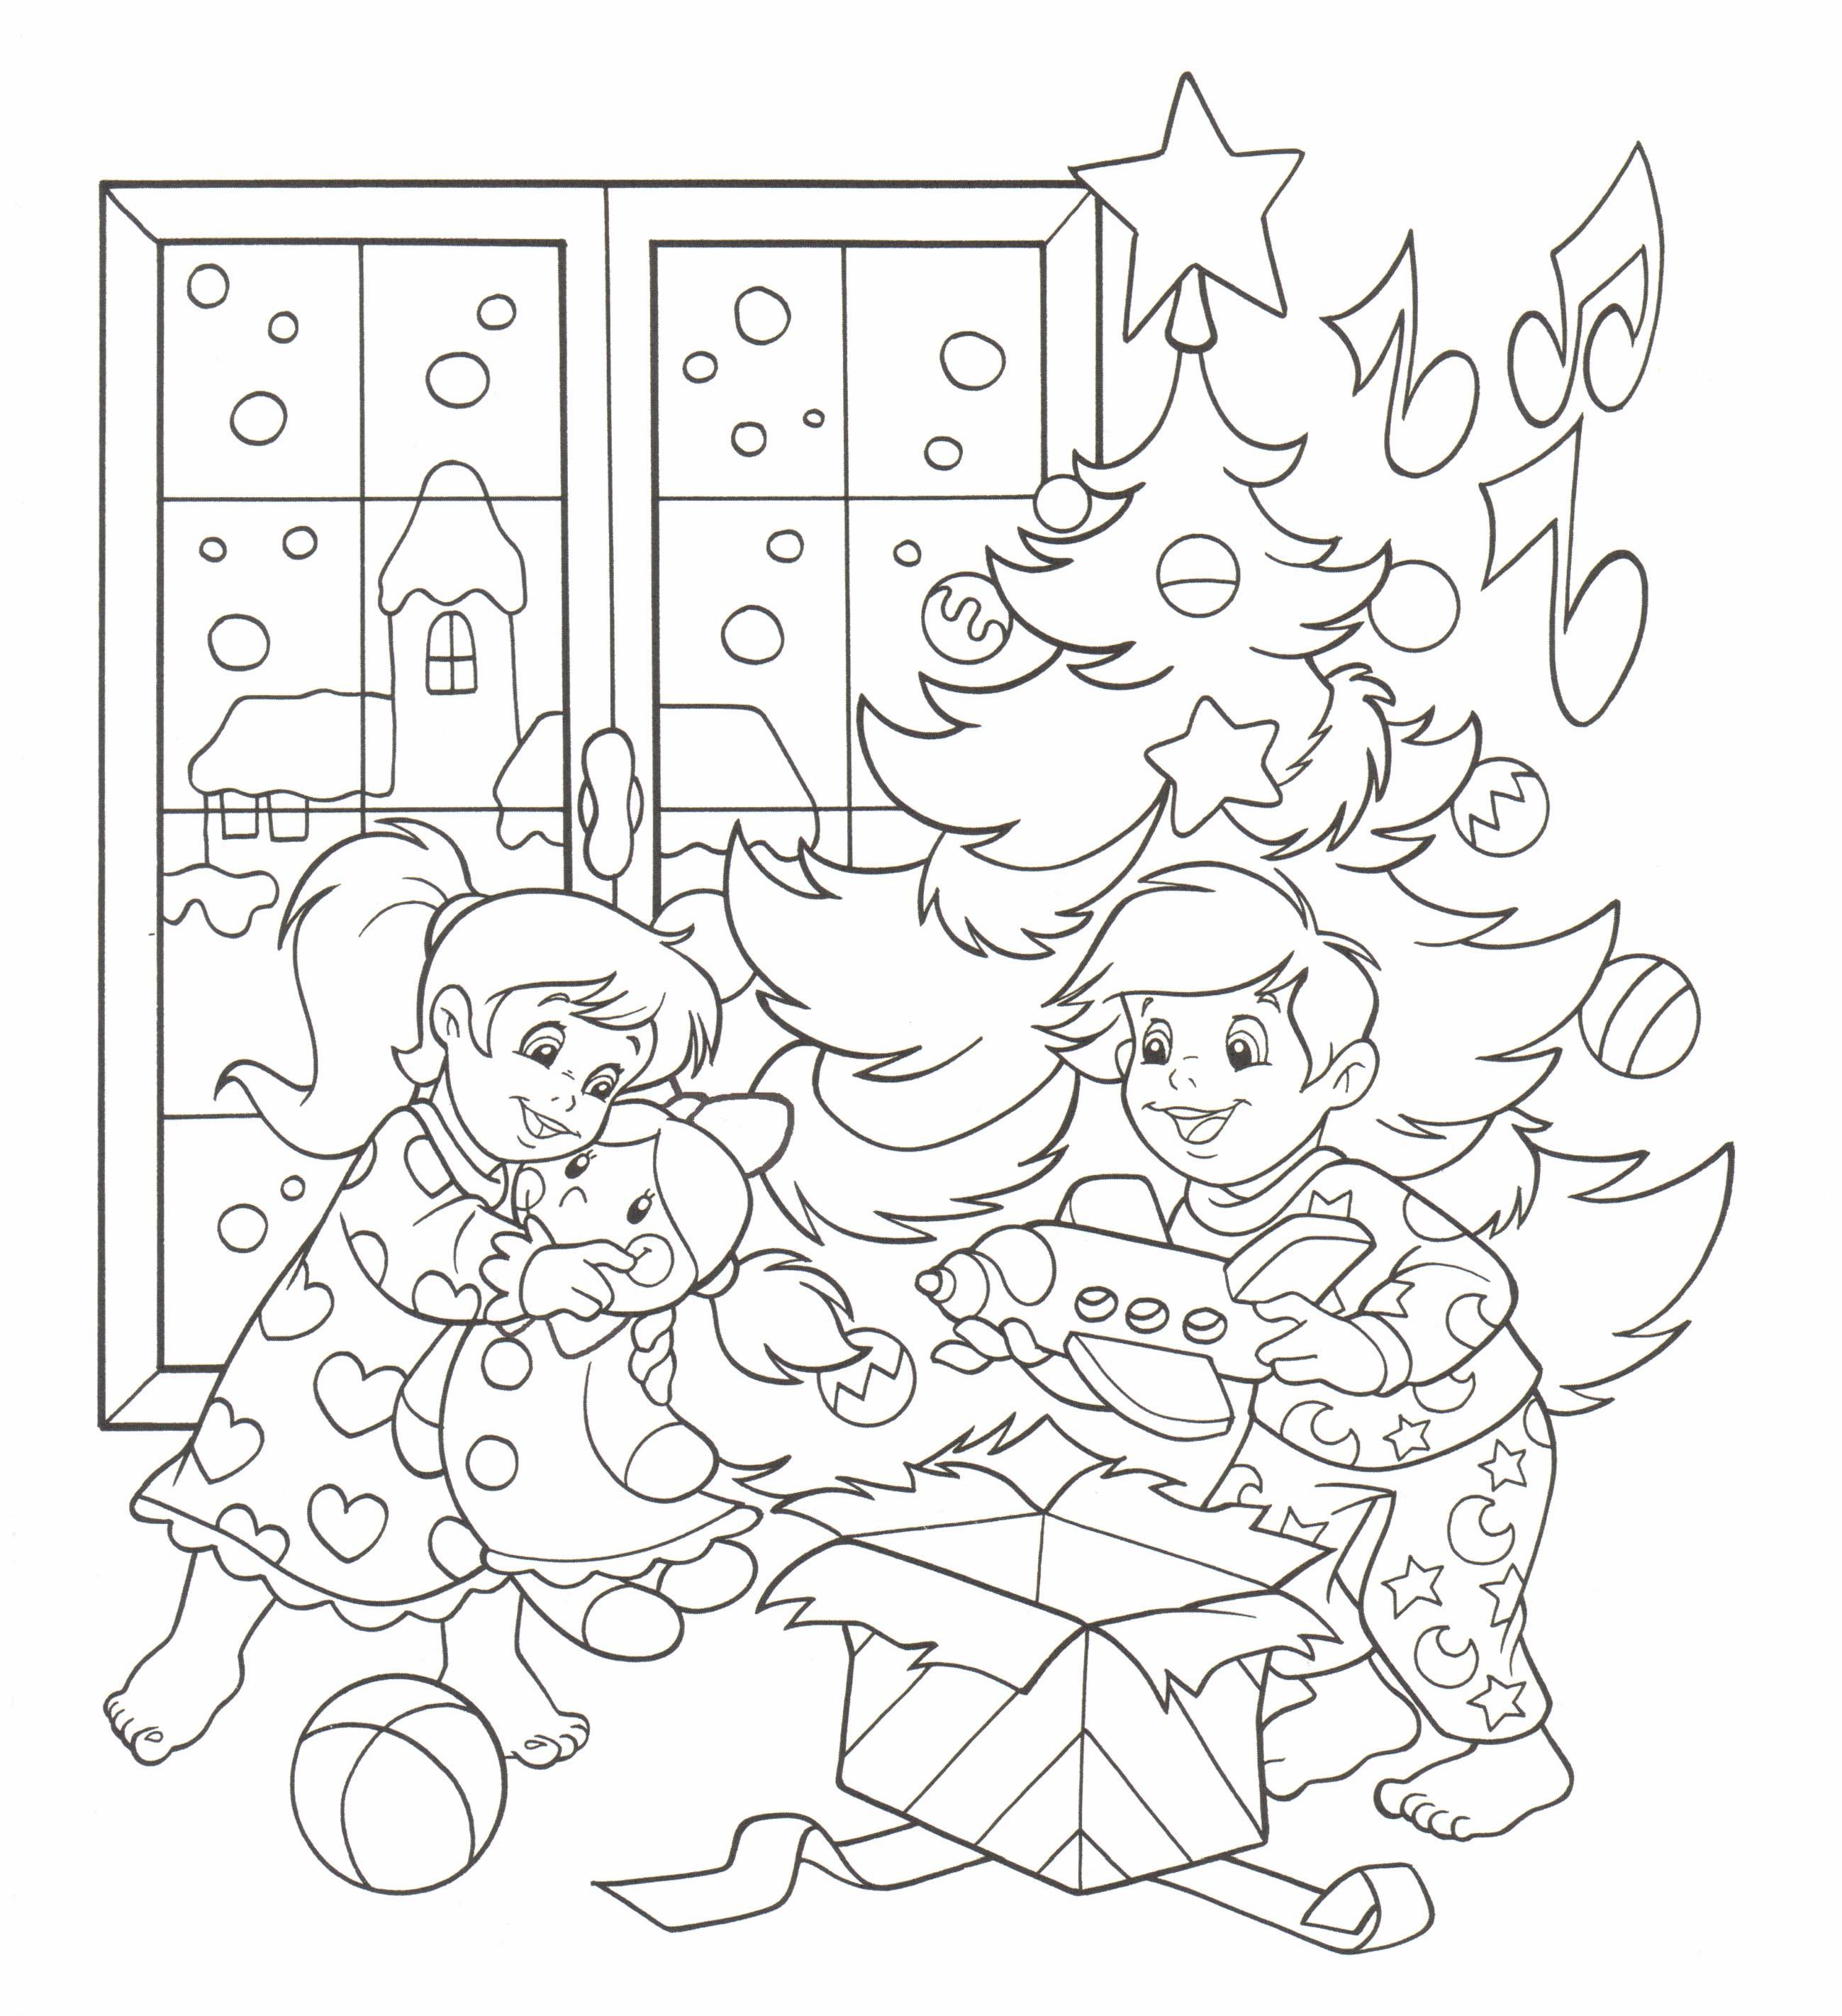 sfatulparintilor.ro_plansecoloat_copiii gasesc cadouri sub brad de craciun